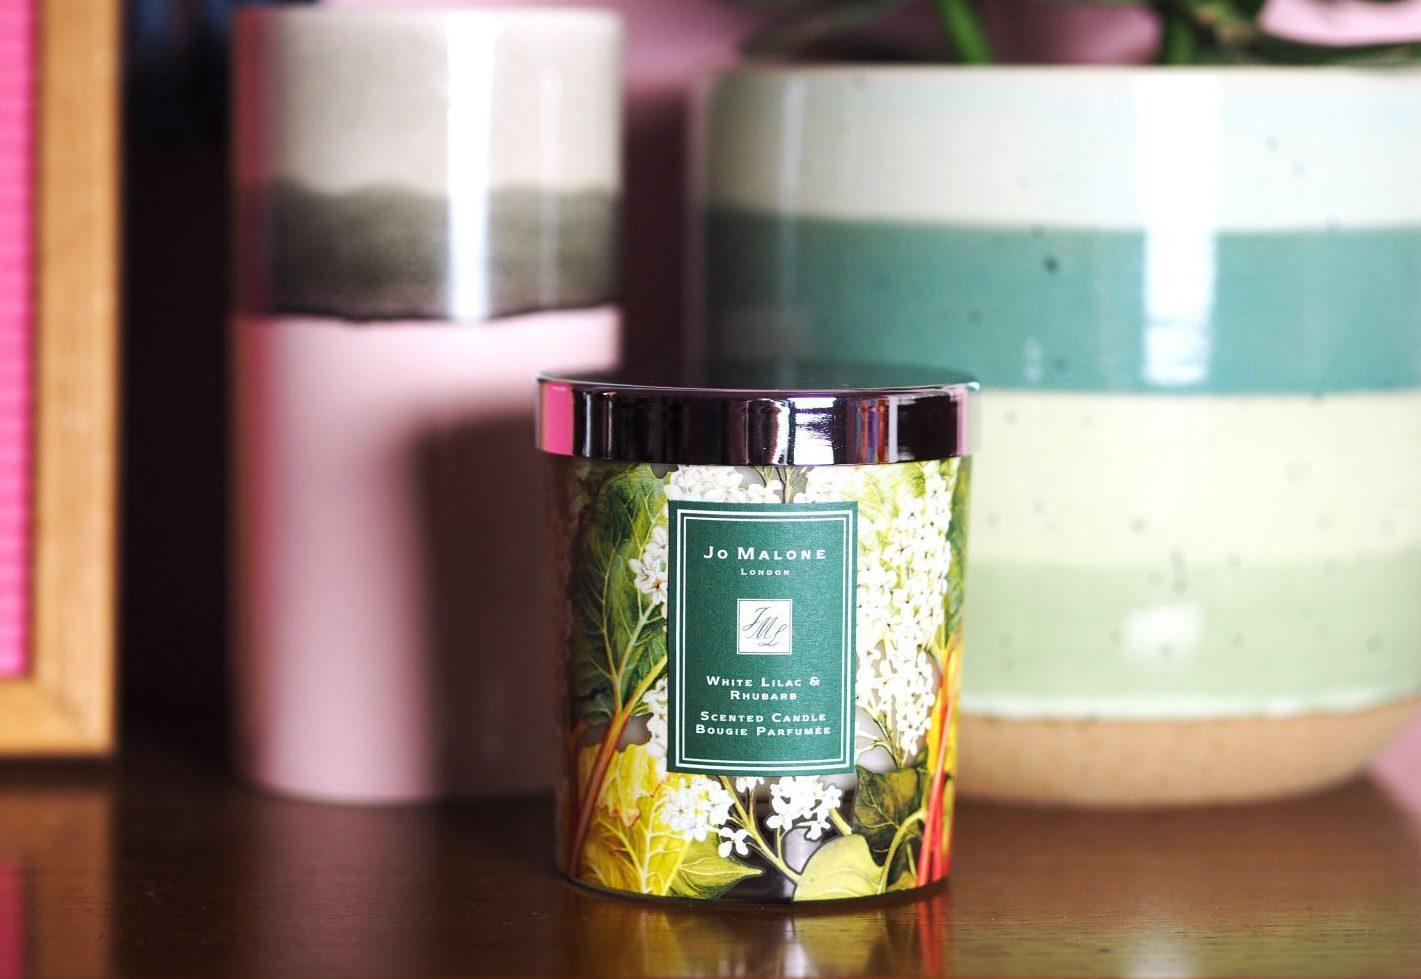 Jo Malone London White Lilac & Rhubarb Charity Candle